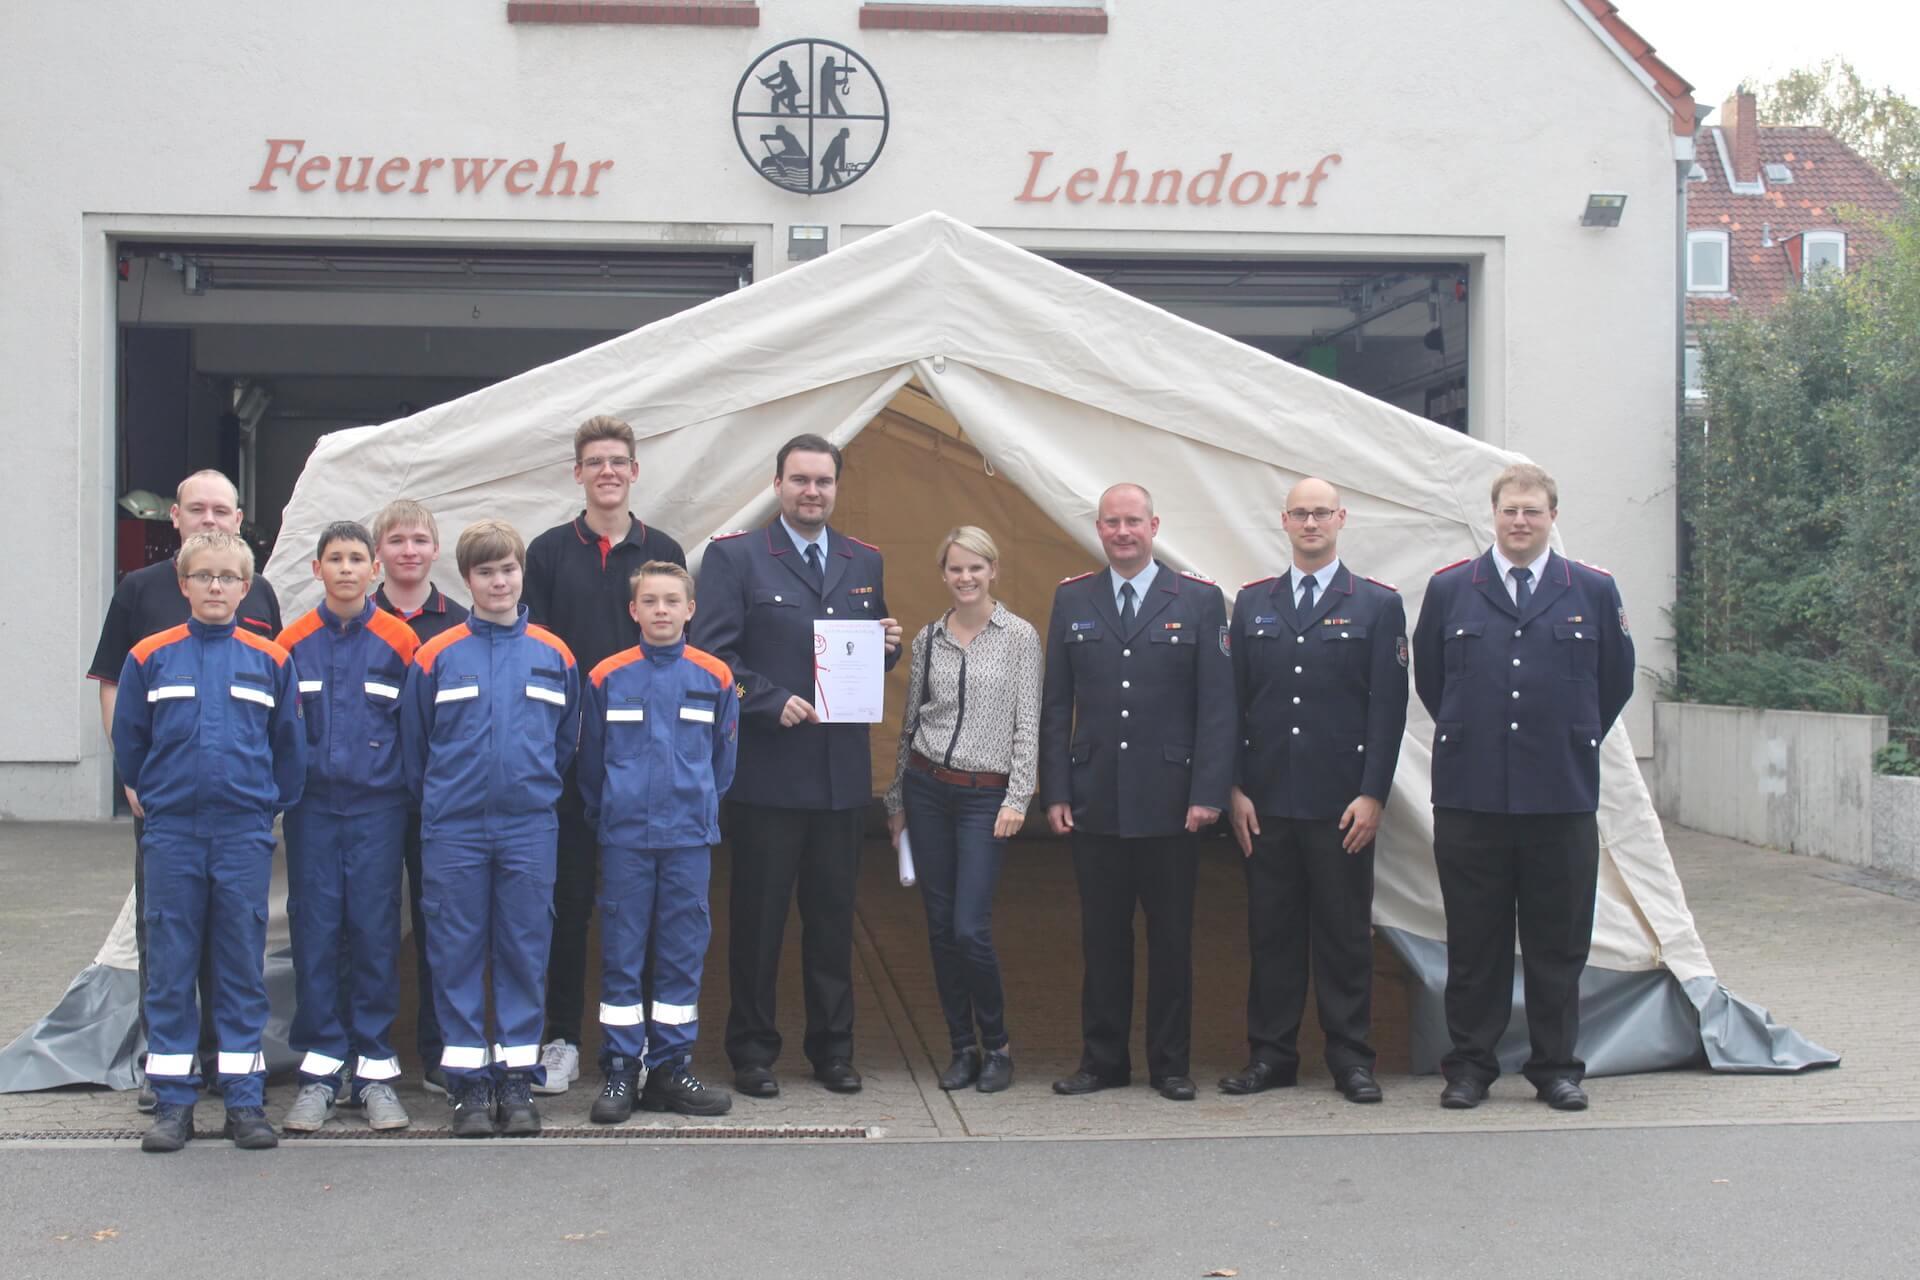 Jugendfeuerwehr Lehndorf 2019